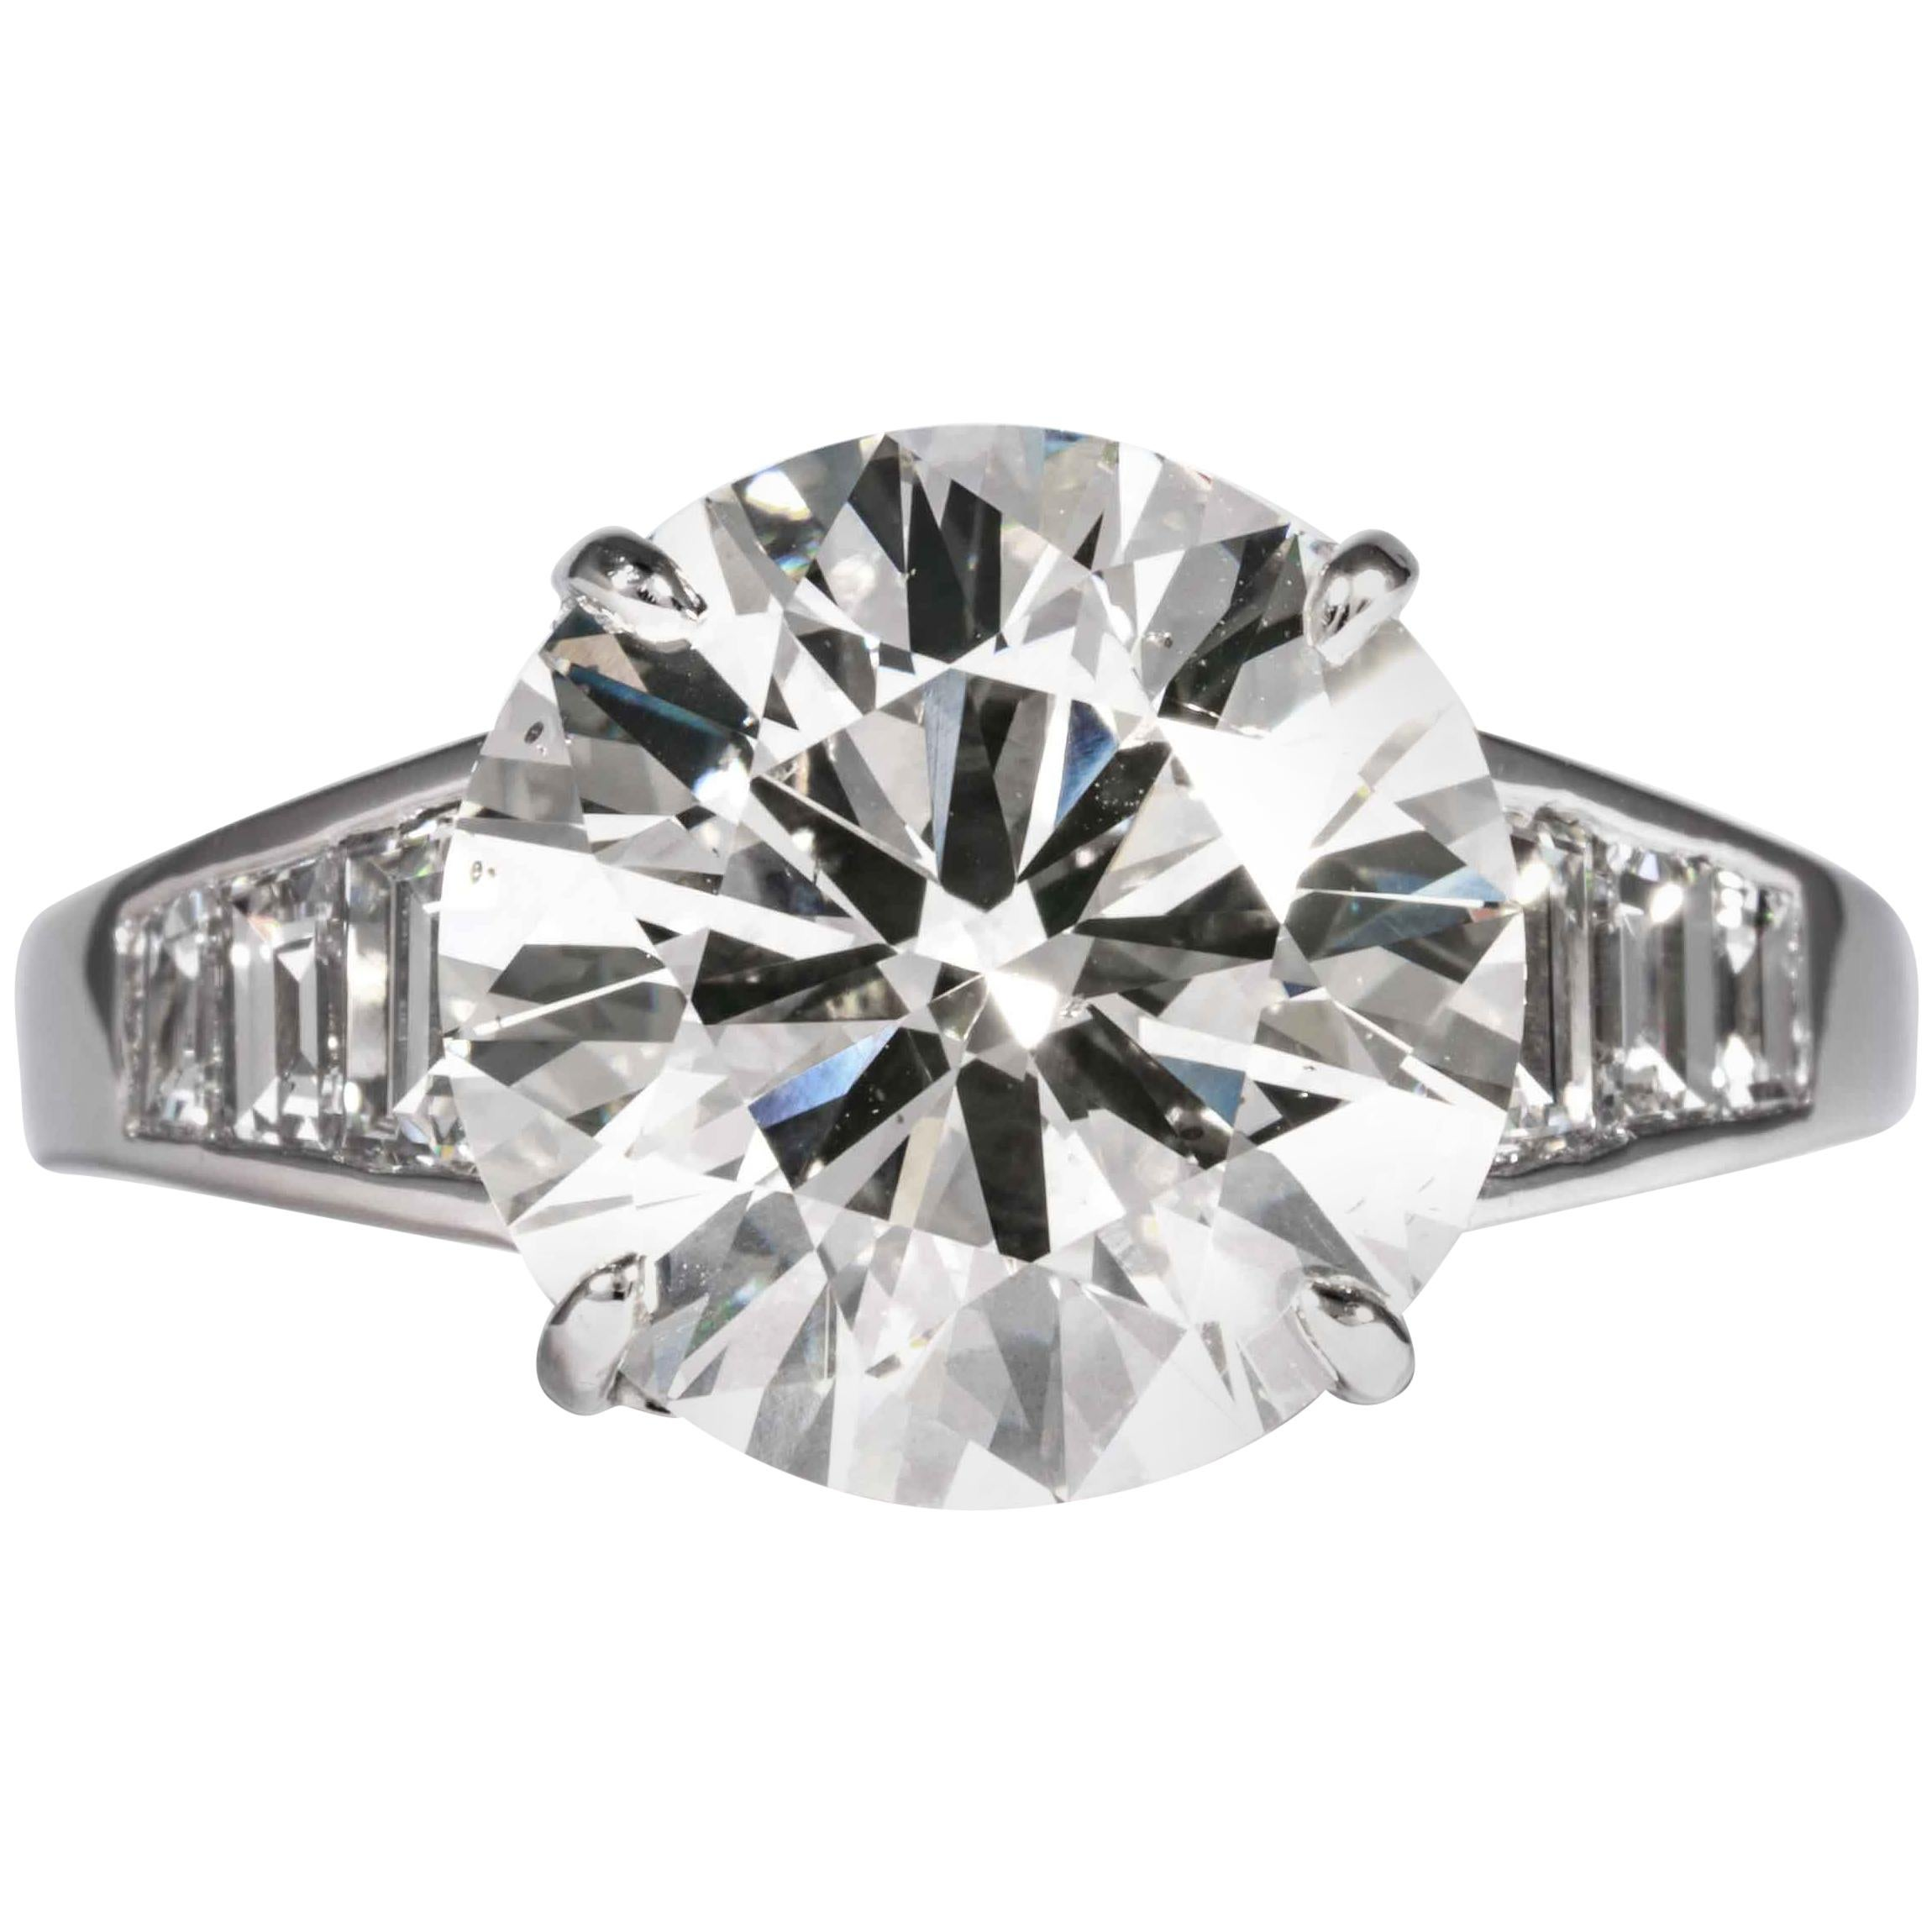 Shreve, Crump & Low GIA Certified 5.60 Carat J SI1 Round Brilliant Diamond Ring